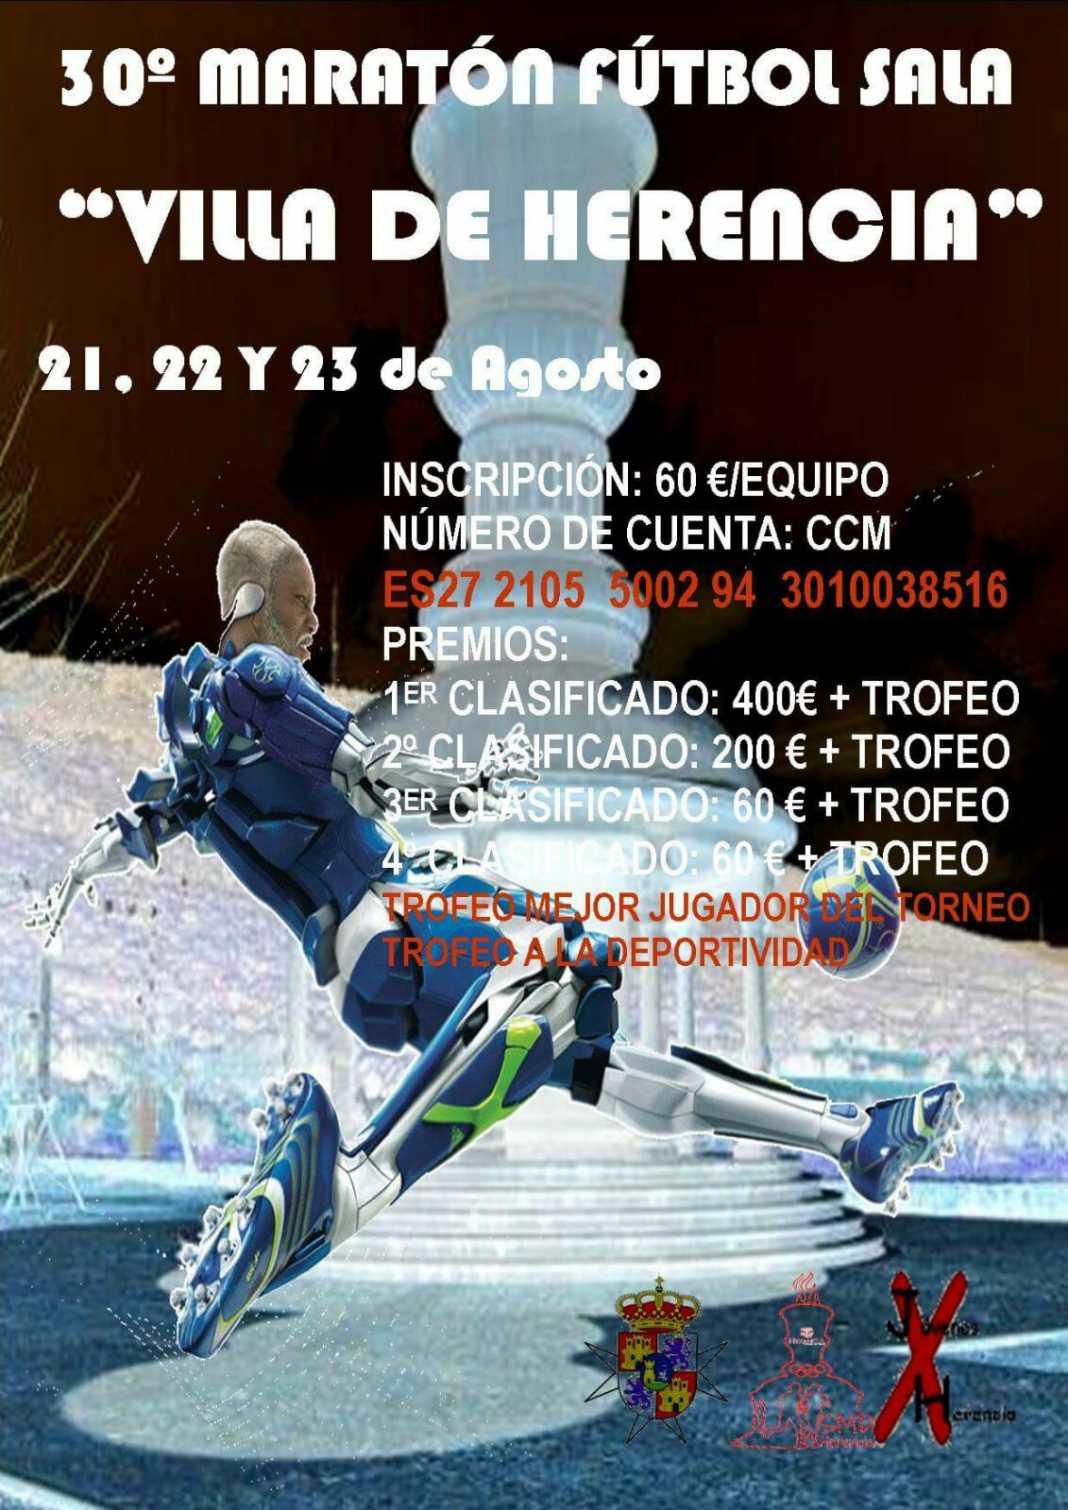 "30 maraton futbol sala herencia 1068x1510 - 30 Maratón Fútbol Sala ""Villa de Herencia"""